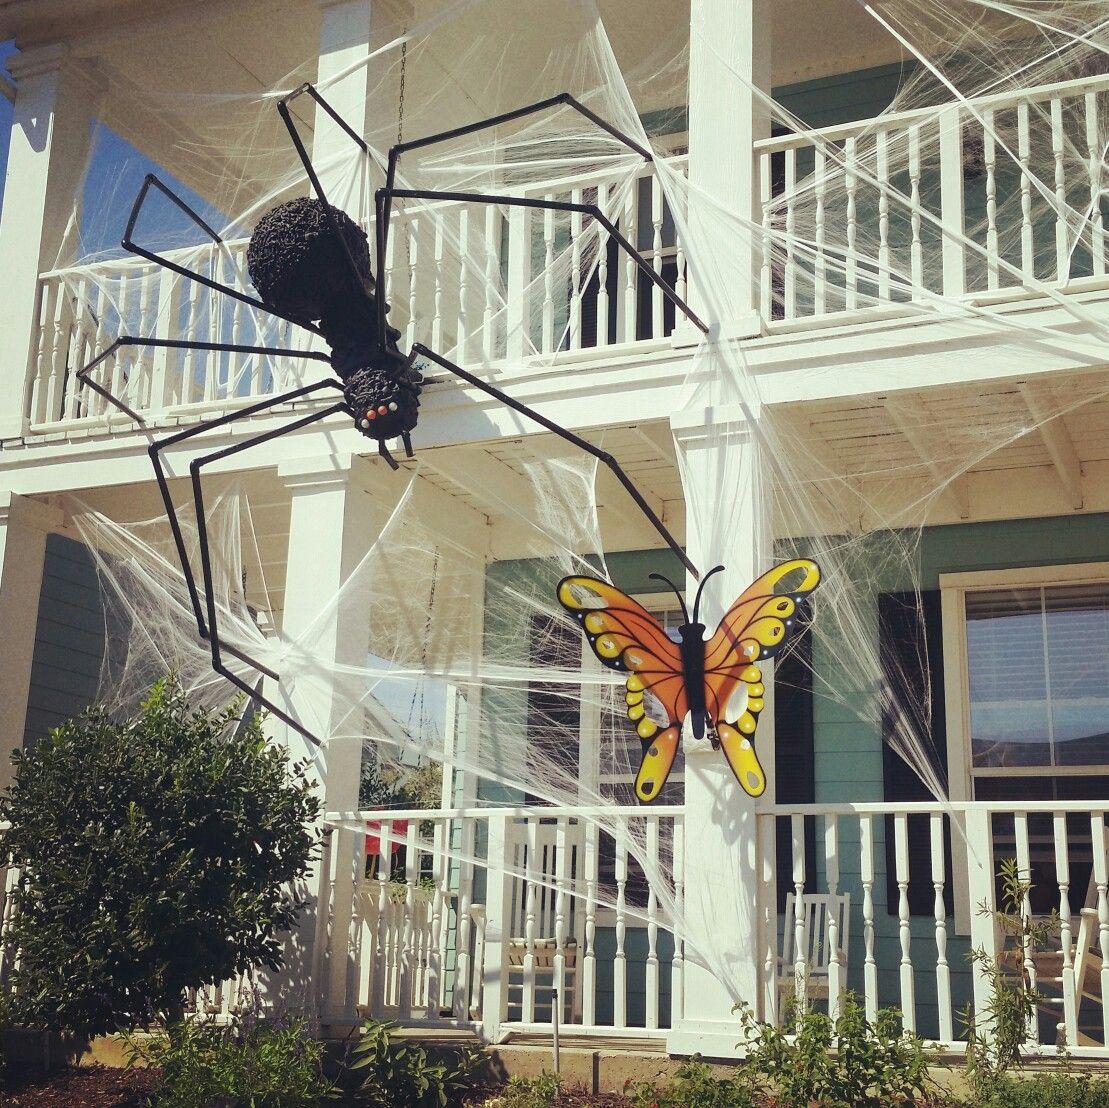 Halloween 2016 Exterior Home Decorations Giant Spider Haunted House Halloween Spider Decorations Halloween Outdoor Decorations Halloween Spider